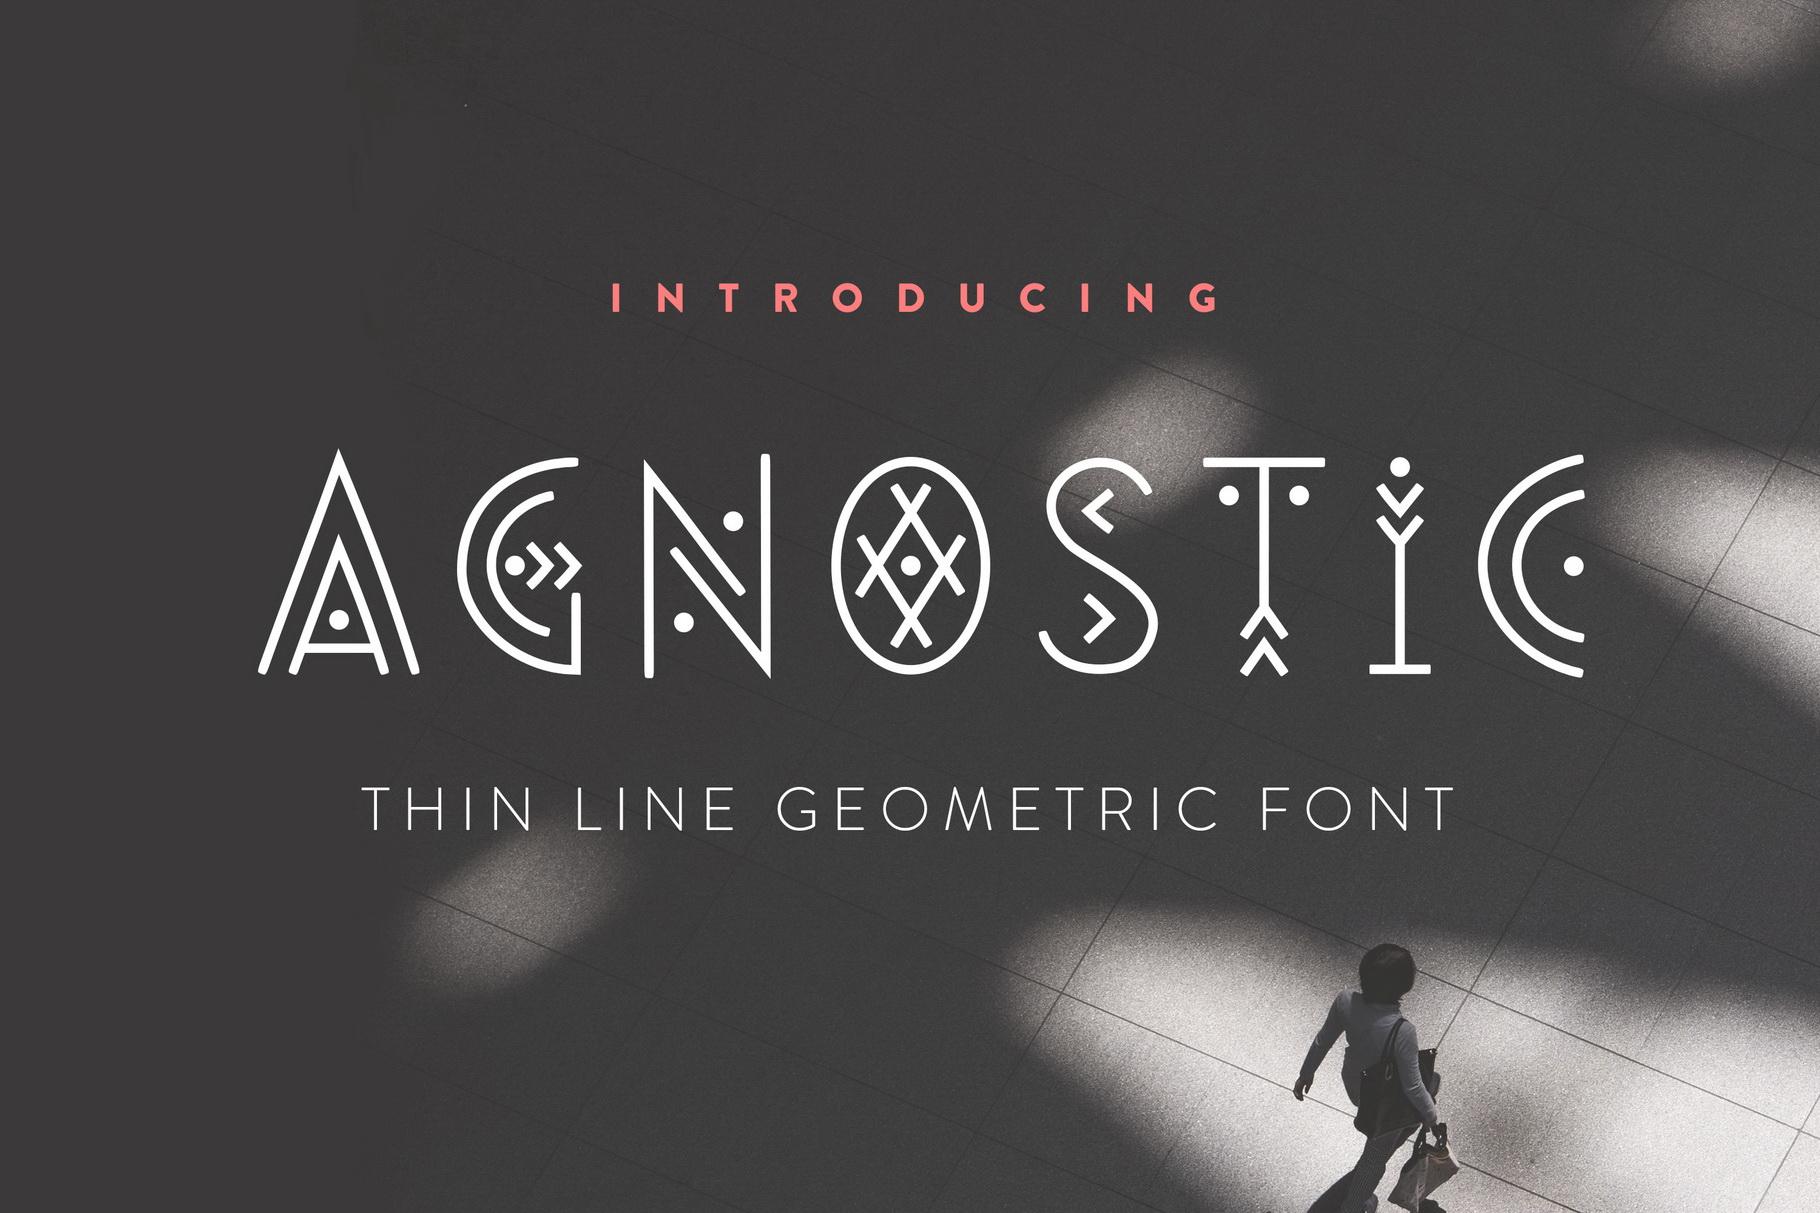 Agnostic - Thin Line Geometric Font example image 1